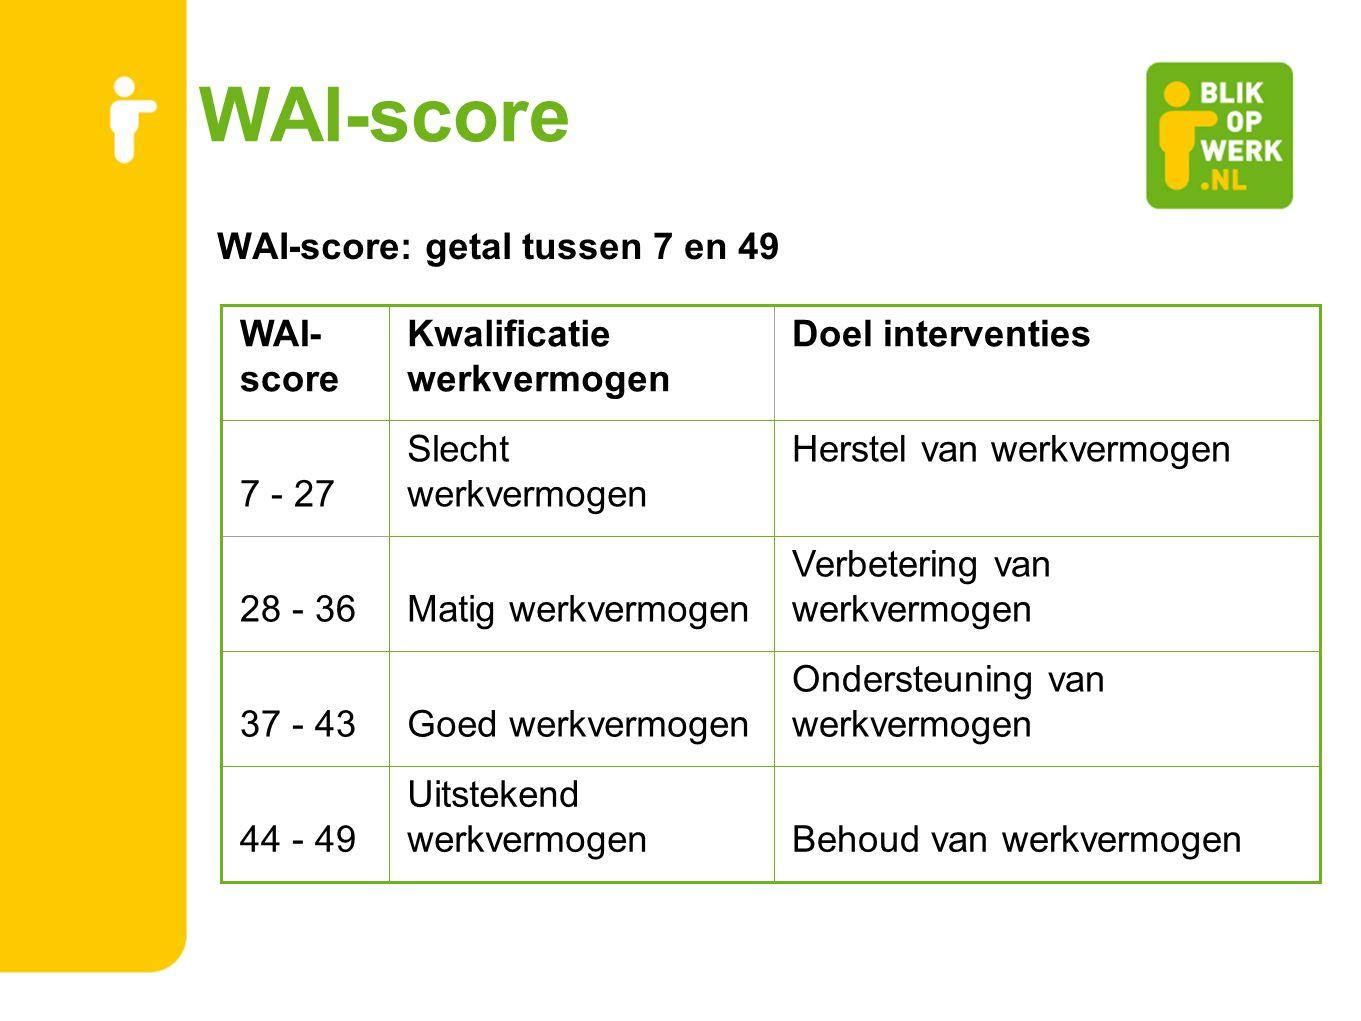 WAI-score WAI-score: getal tussen 7 en 49 WAI-score